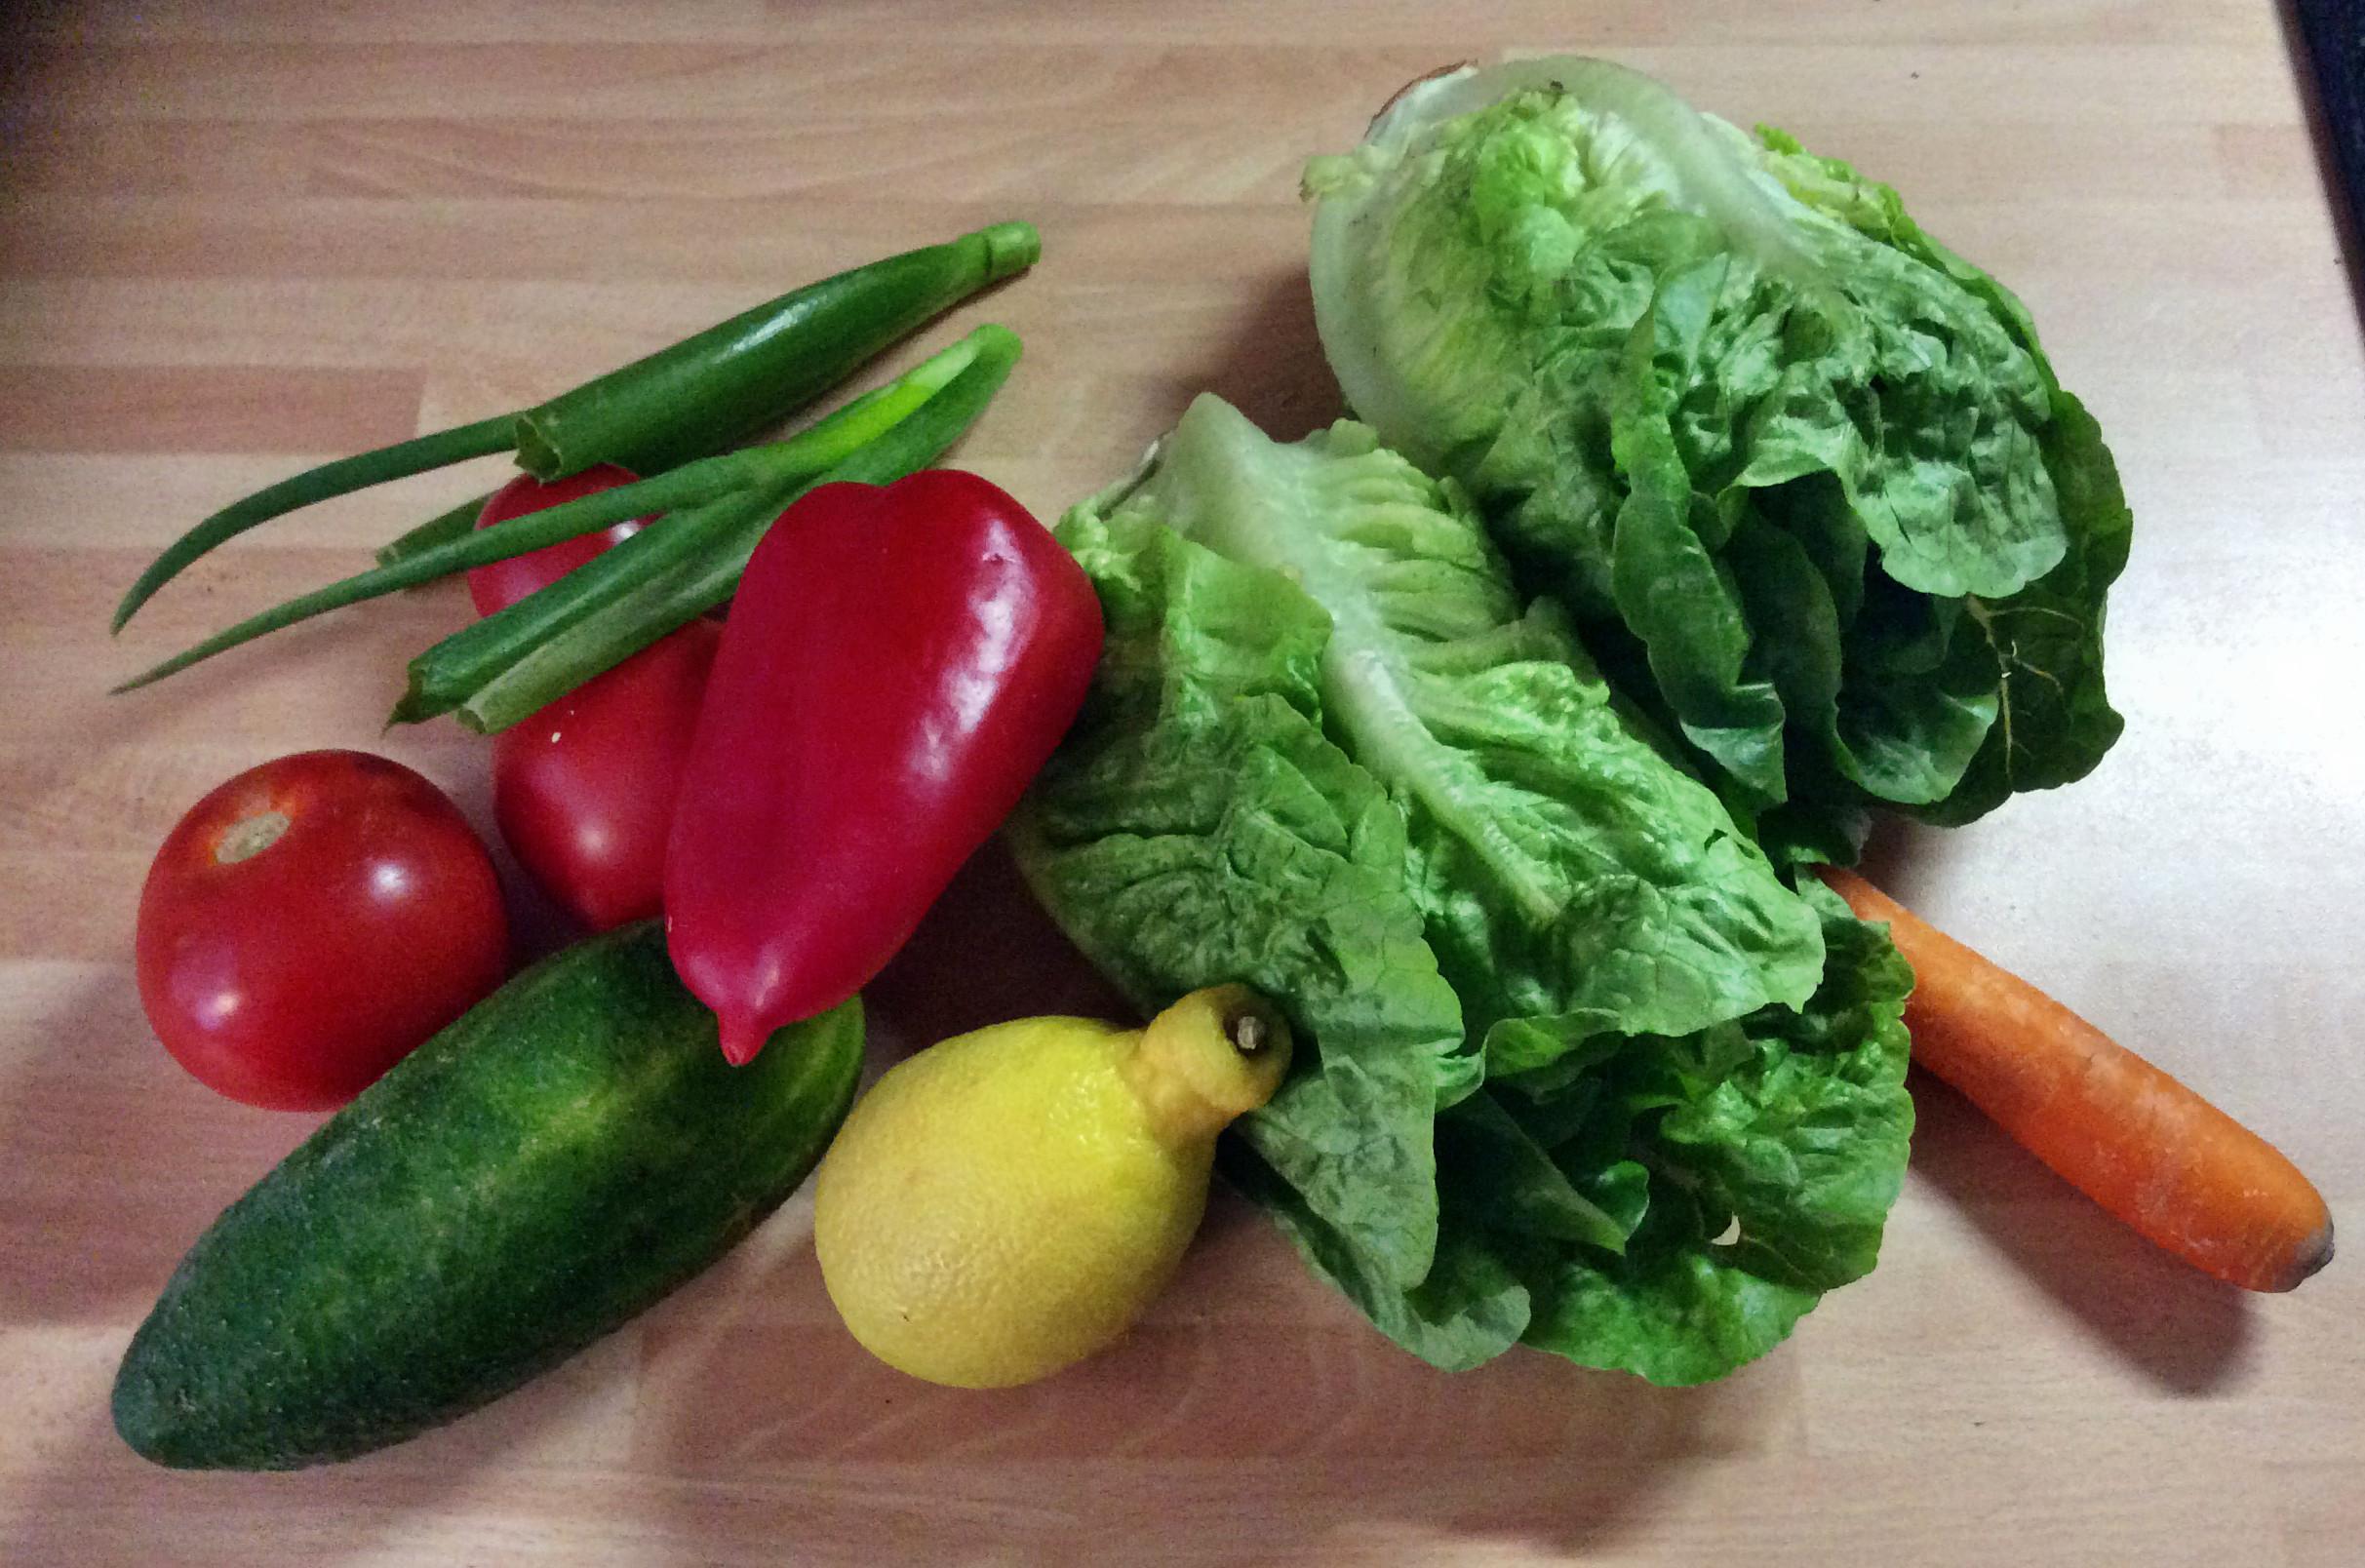 Marinierter Hering,gemischter Salat,Kartoffeln - 7.10.15   (1b)